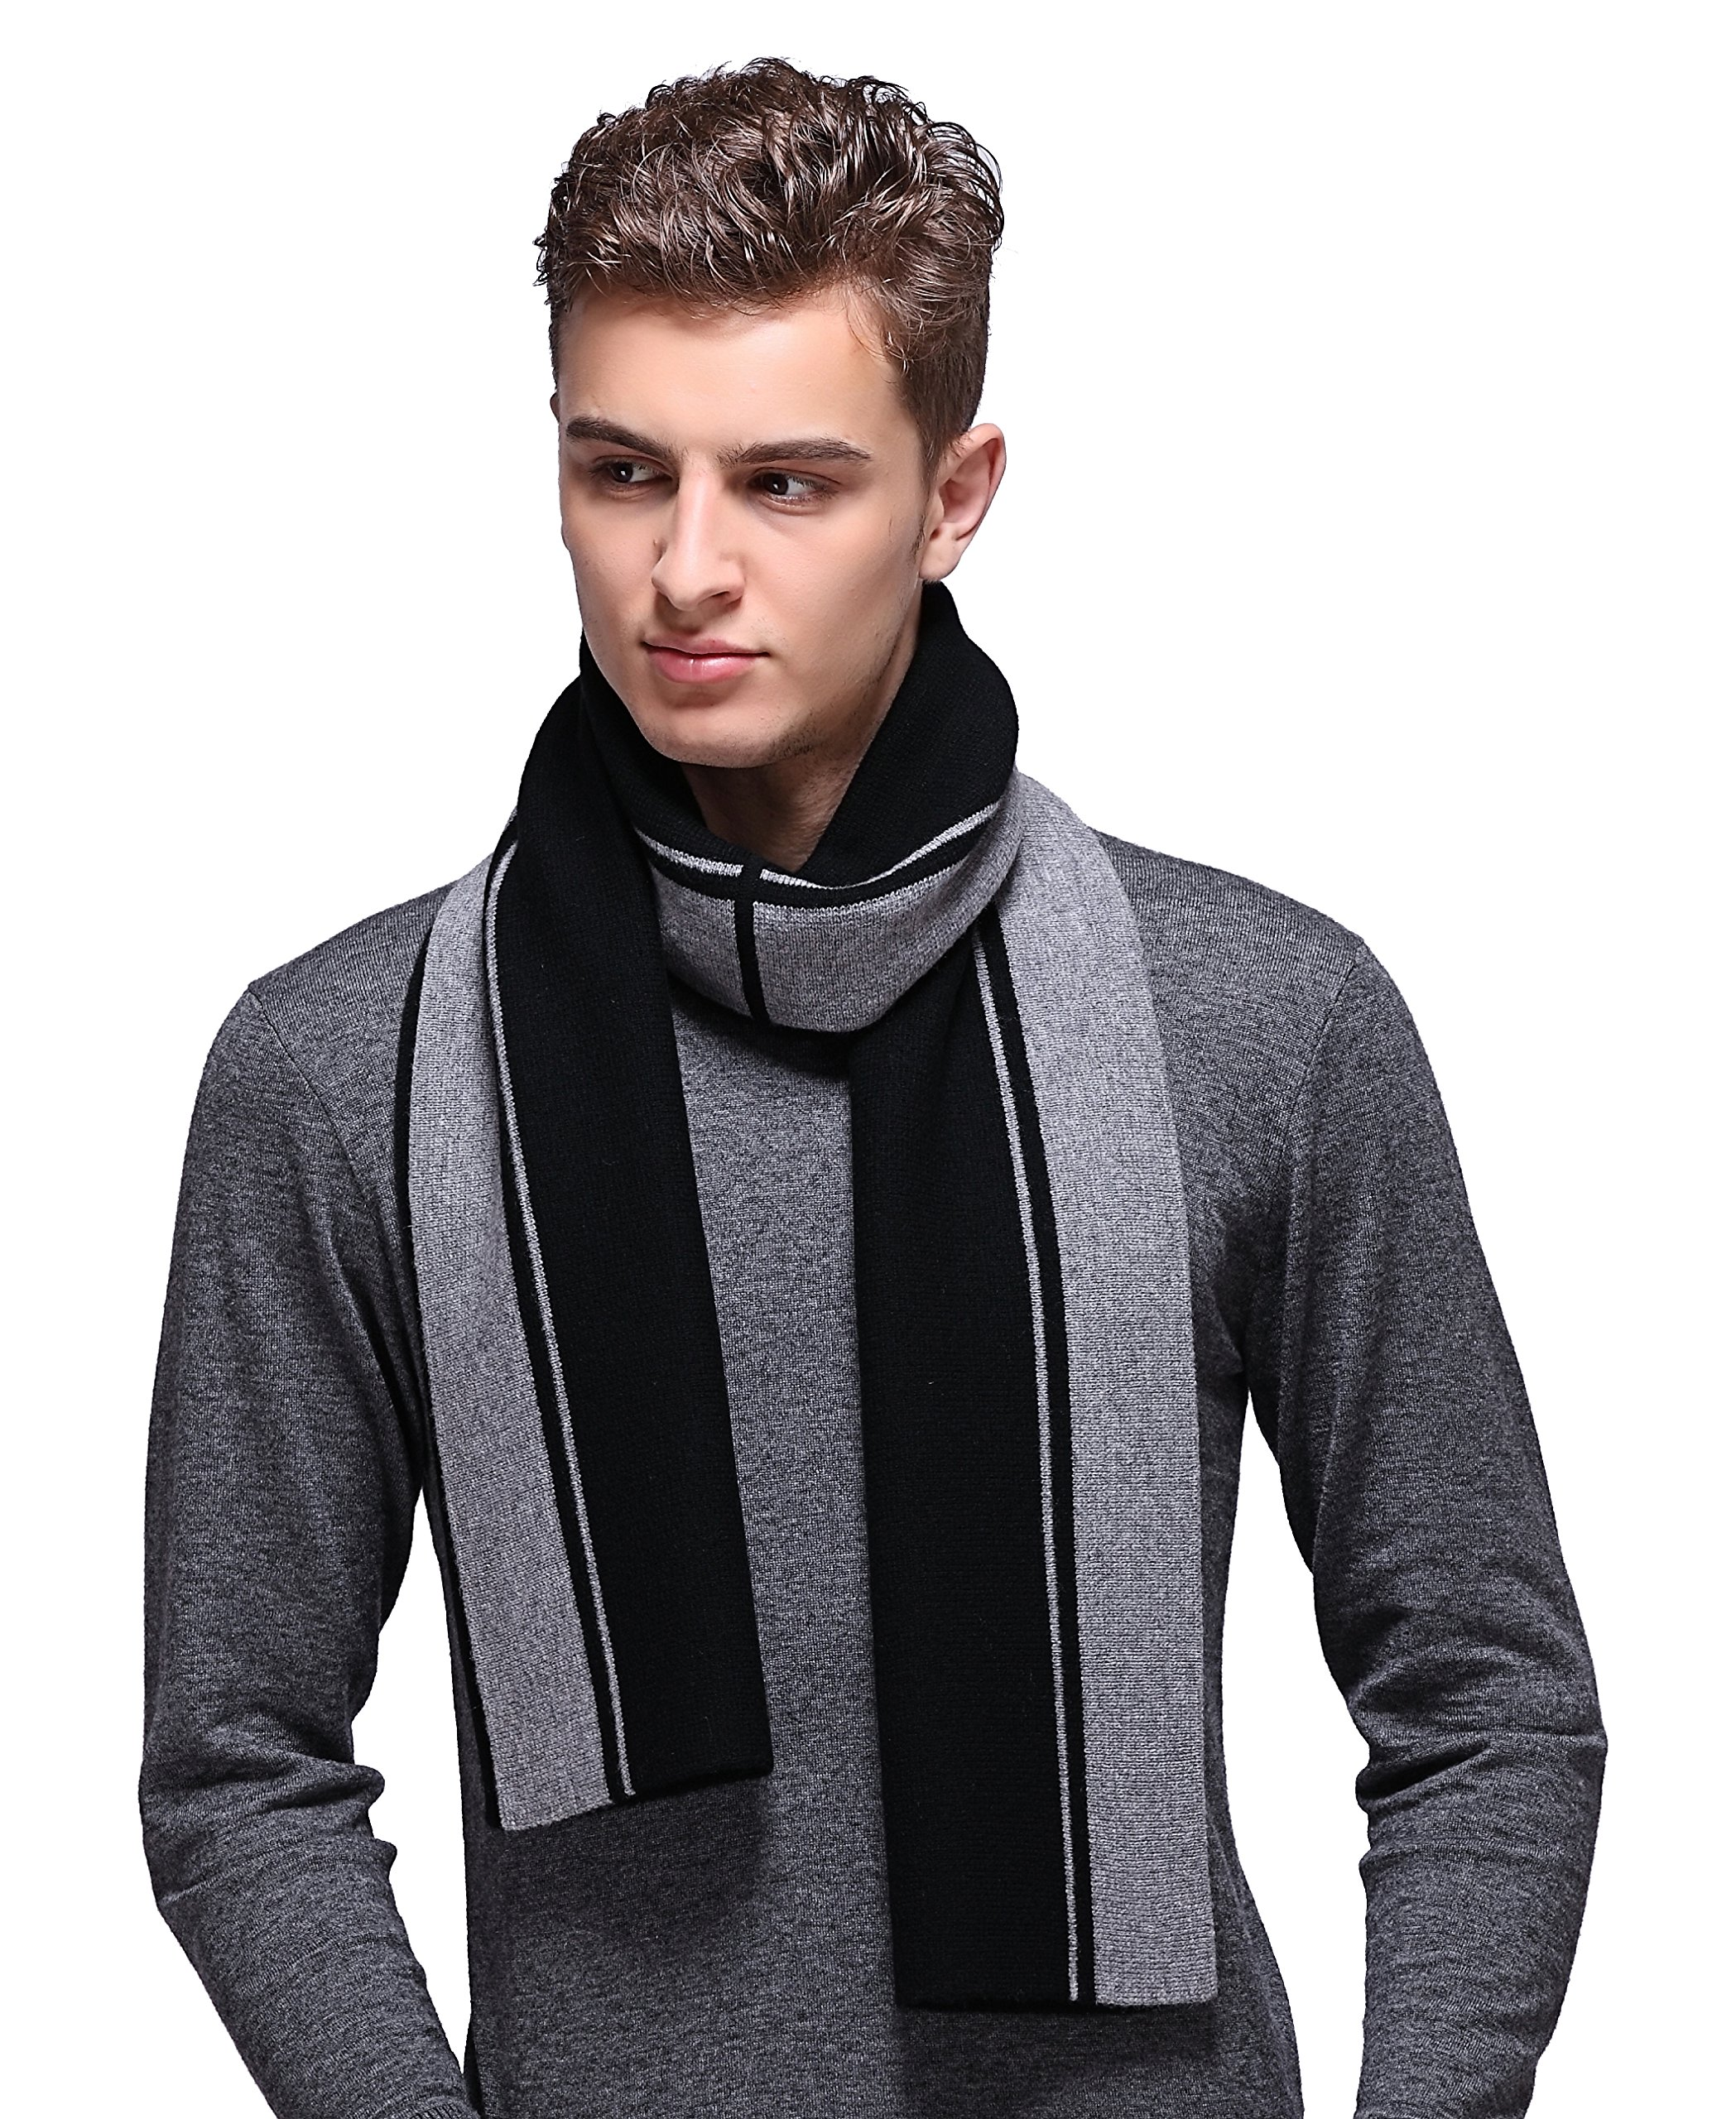 Ellettee, Stripe BlackGrey 100% Australian Wool Men Scarf Classic Premium Luxurious Knitted Long Neckwear Elegant Stripe Plaid Scarves